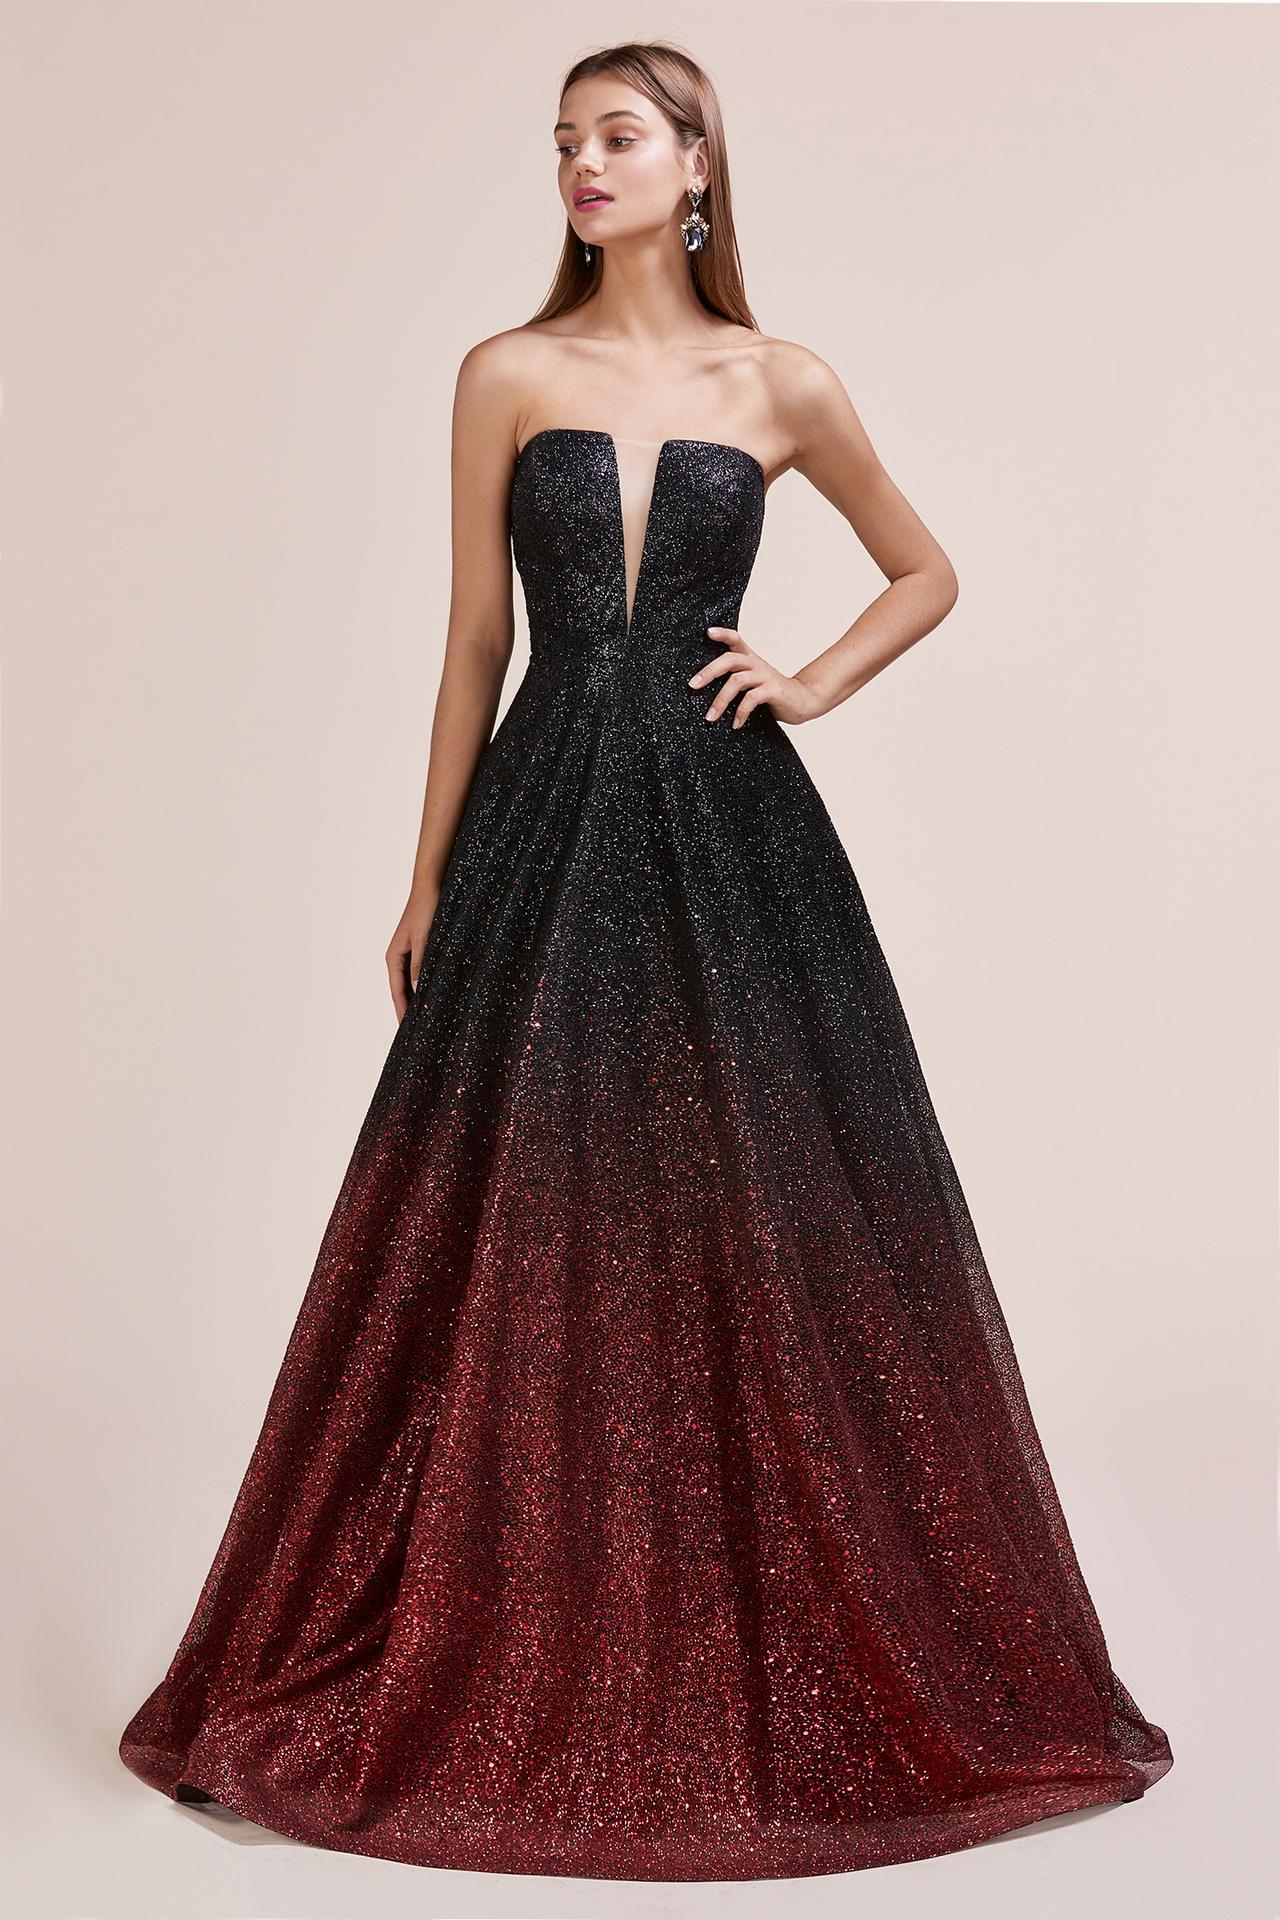 Nové spoločenské šaty :) - Obrázok č. 35